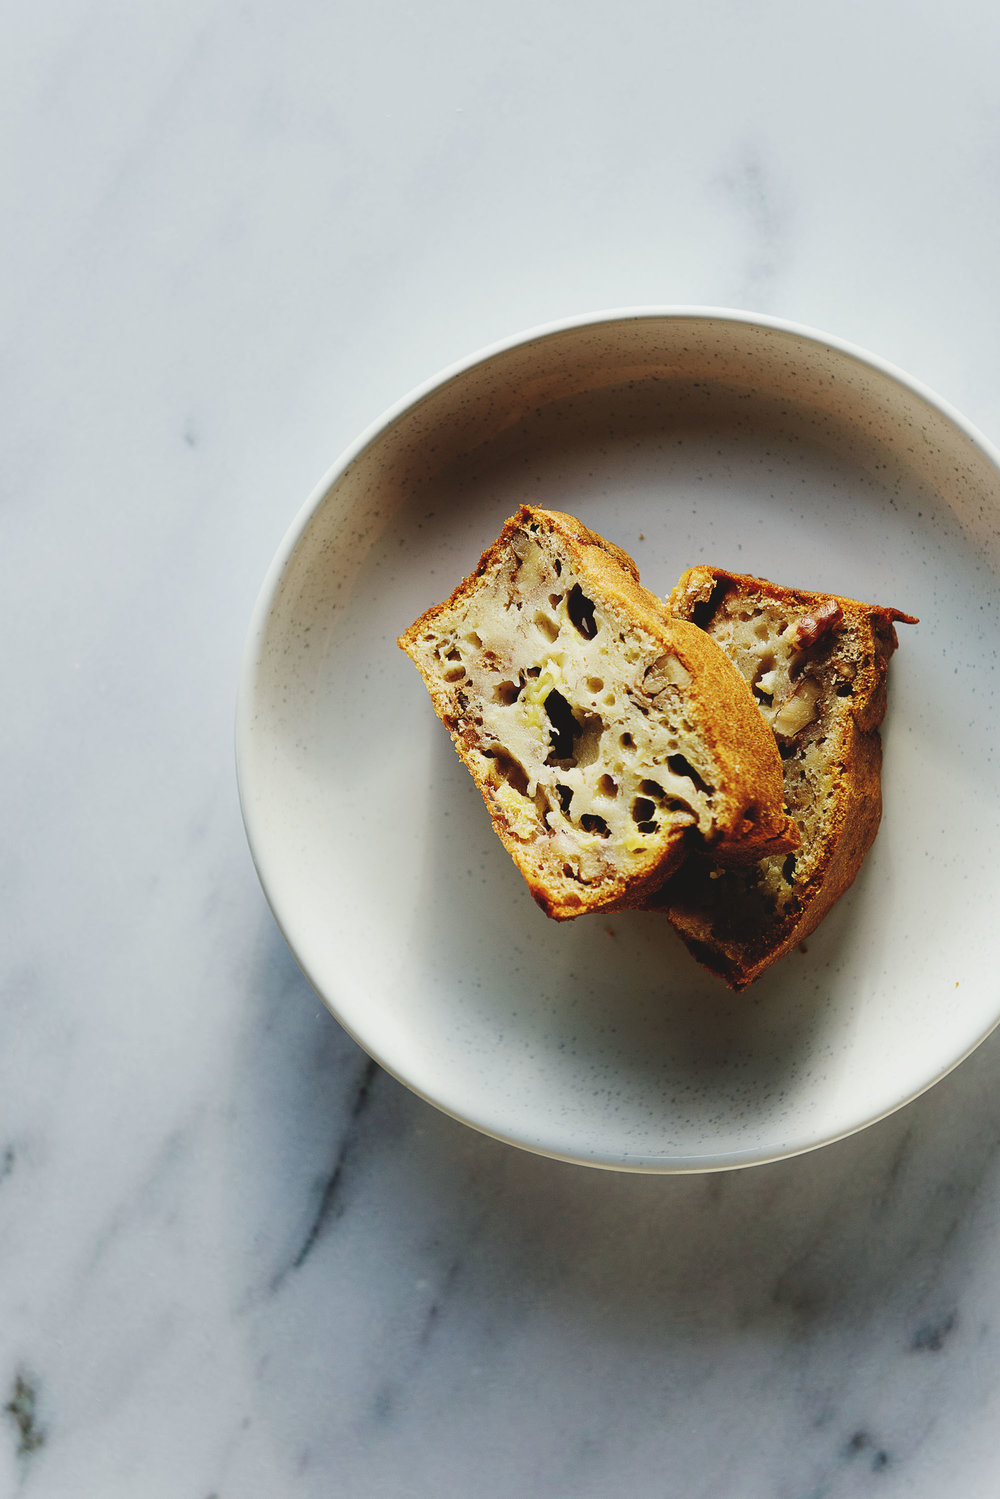 ragnhild-utne-utnephoto-eat-bud-eatbud-sugar-free-banana-bread-recipe-5.jpg